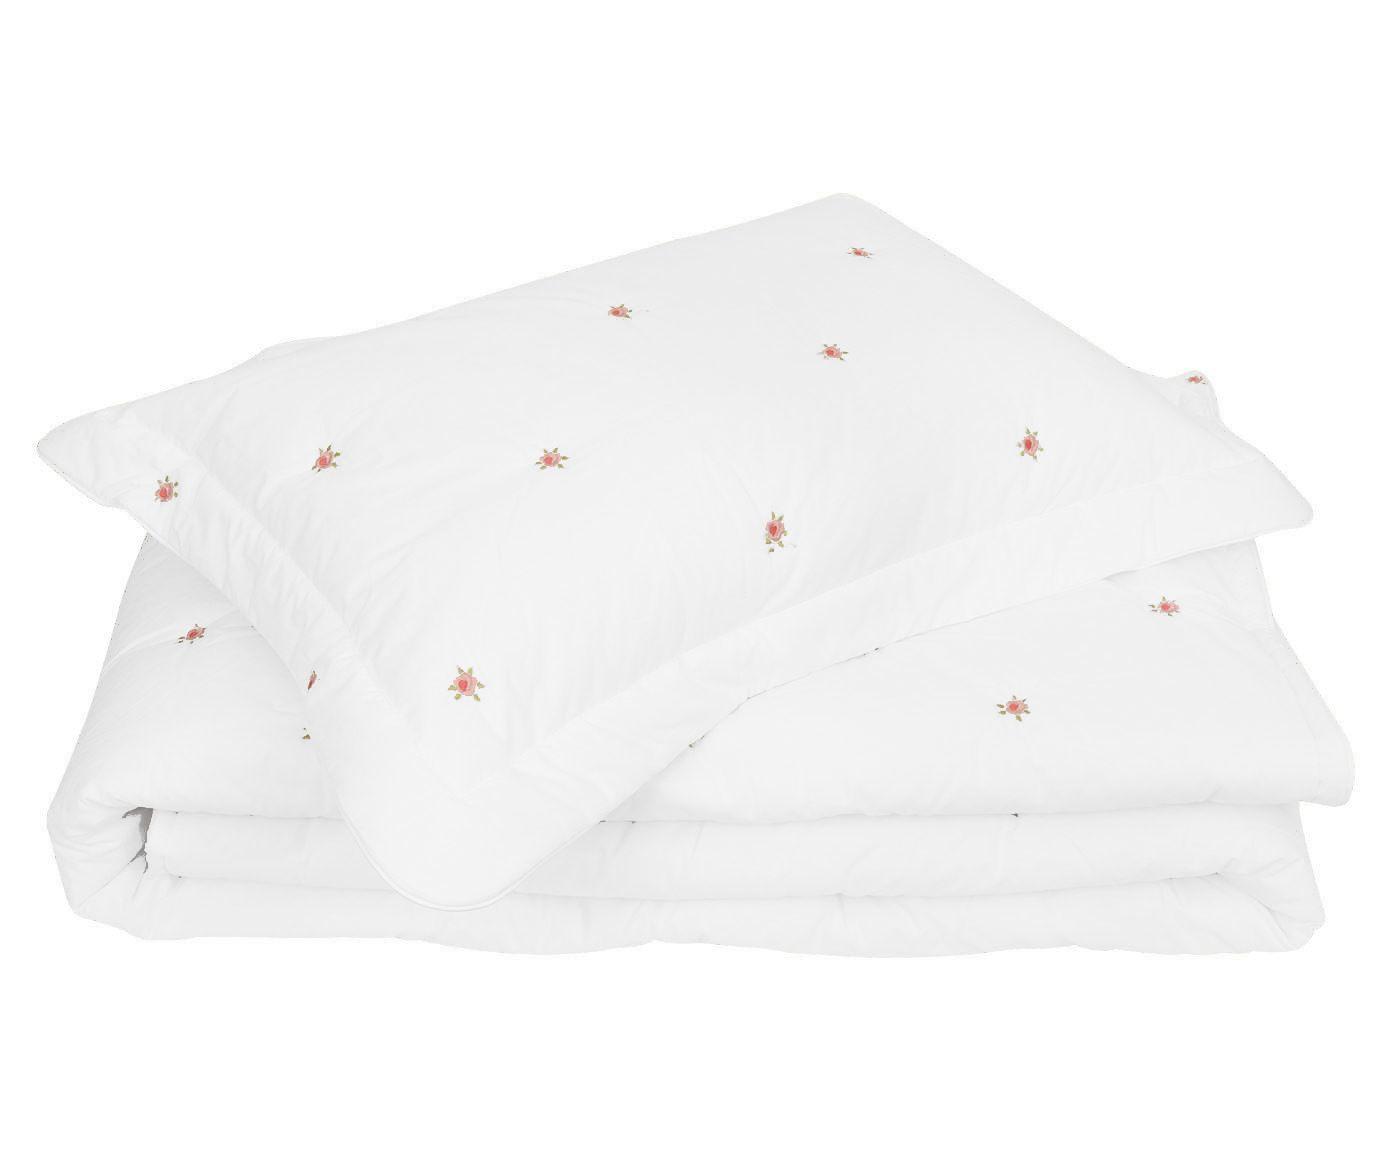 Jogo de Cobre-Leito Esplendore Dots 200 Fios - Queen Size | Westwing.com.br